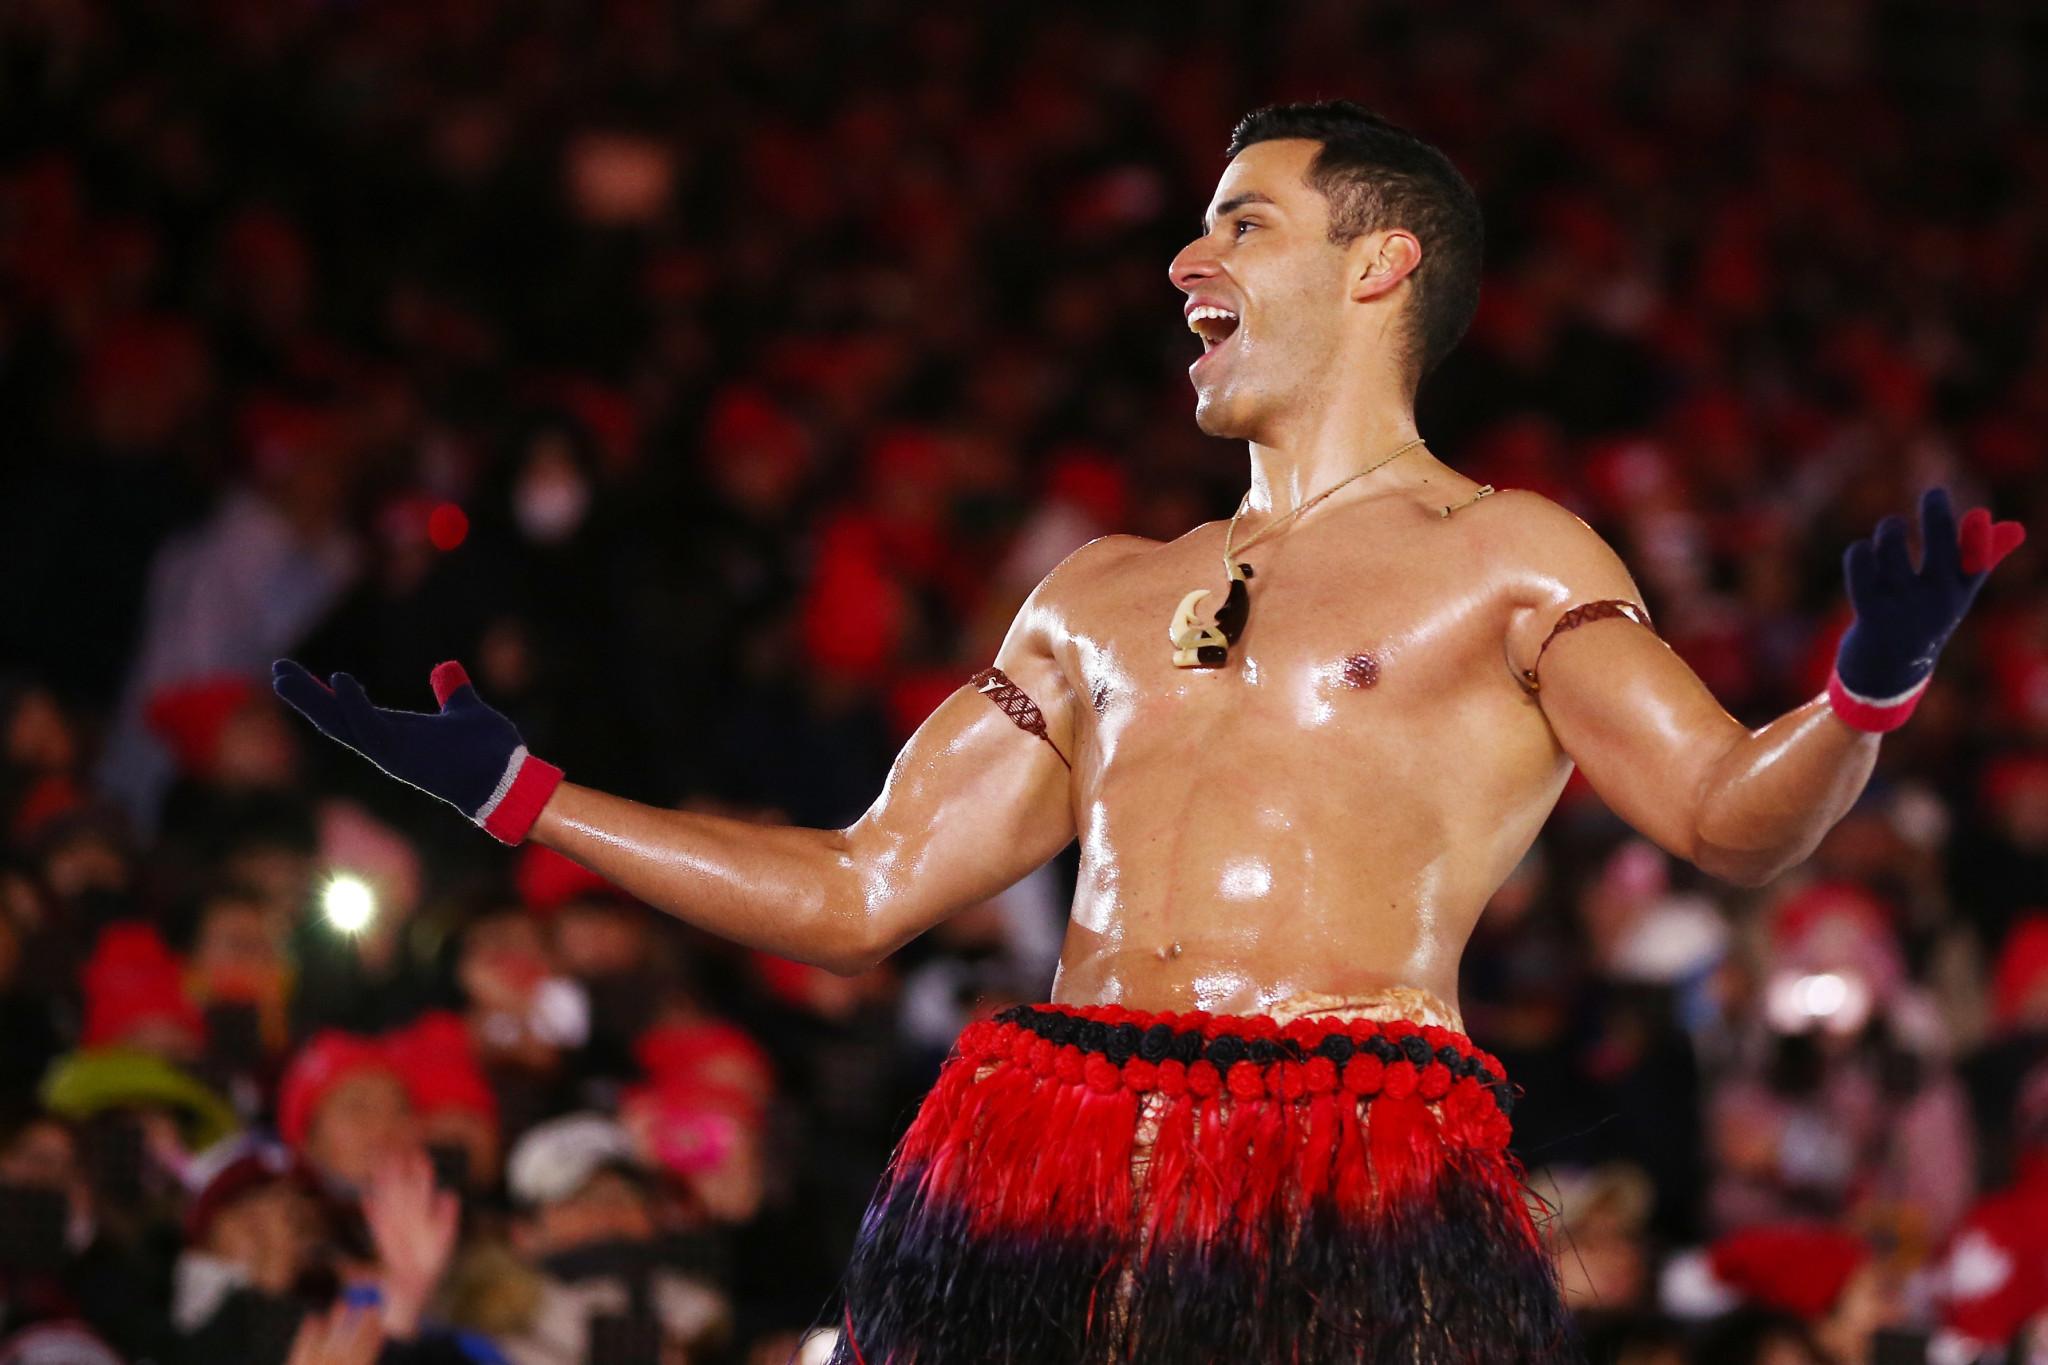 Tonga taekwondo gold medallist thanks Rio 2016 flag bearer Taufatofua